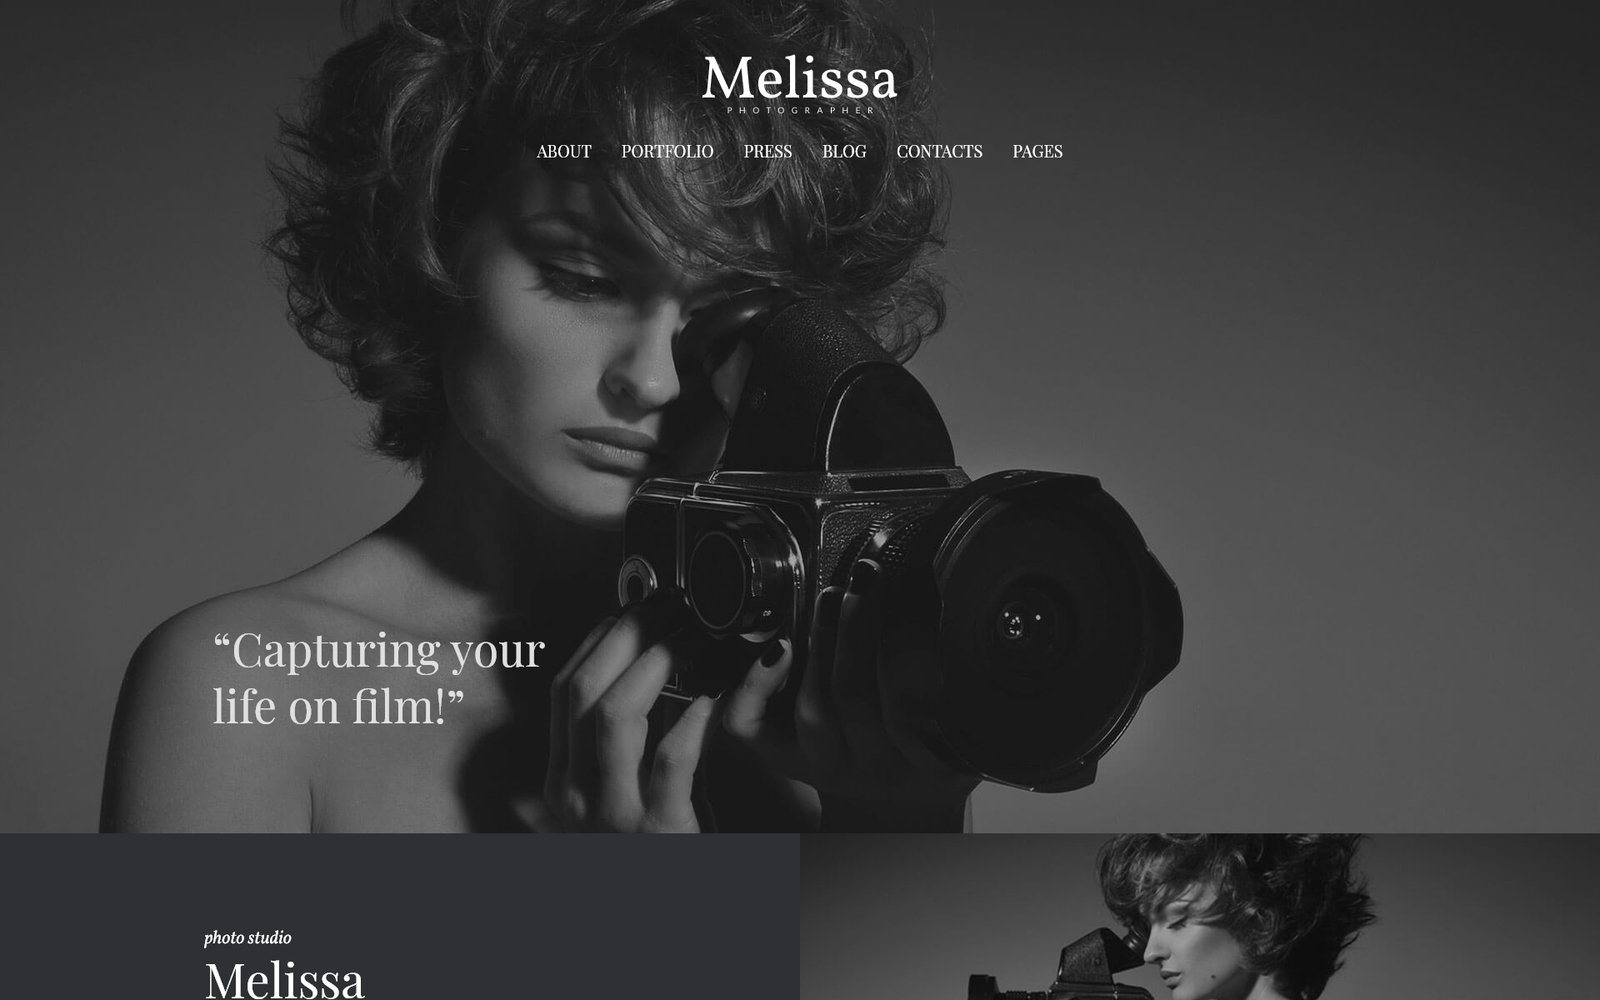 Responsivt Melissa - Art & Photography & Photographer Portfolio & Photo Studio Responsive WordPress Theme WordPress-tema #52153 - skärmbild